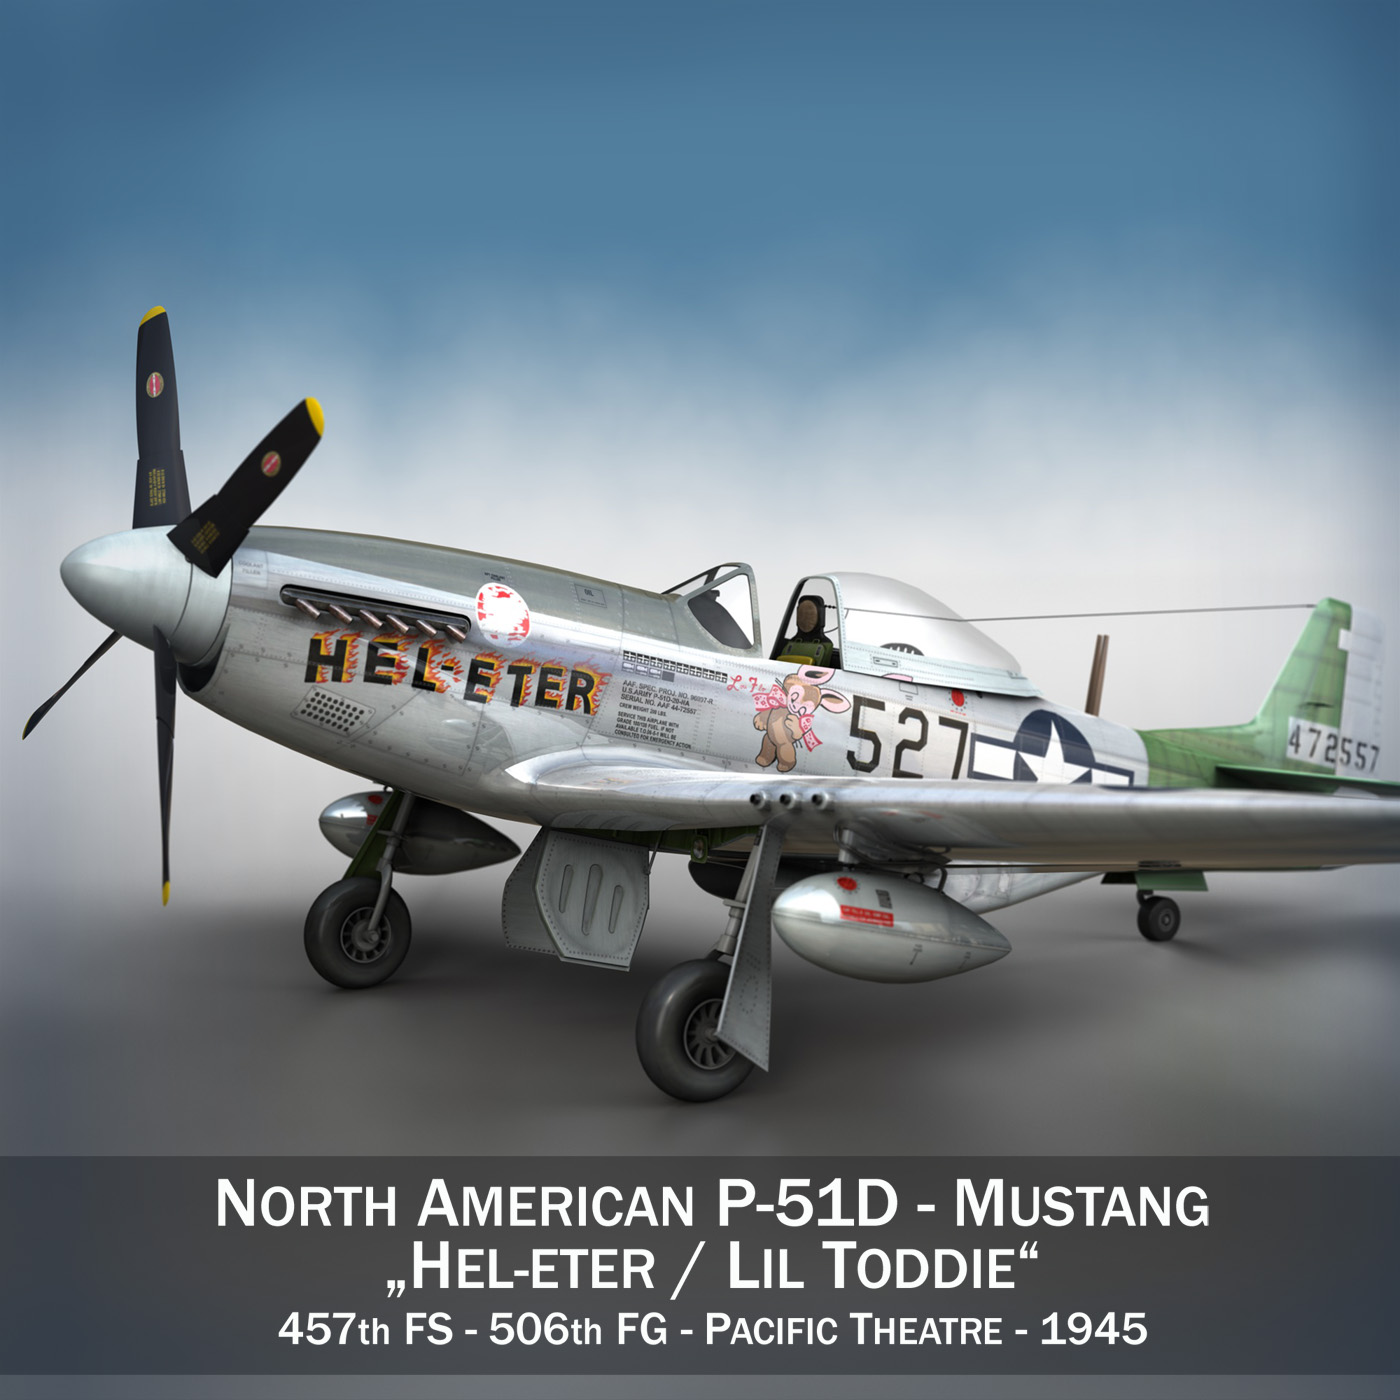 north american p-51d – mustang – heleter 3d model fbx c4d lwo obj 267540